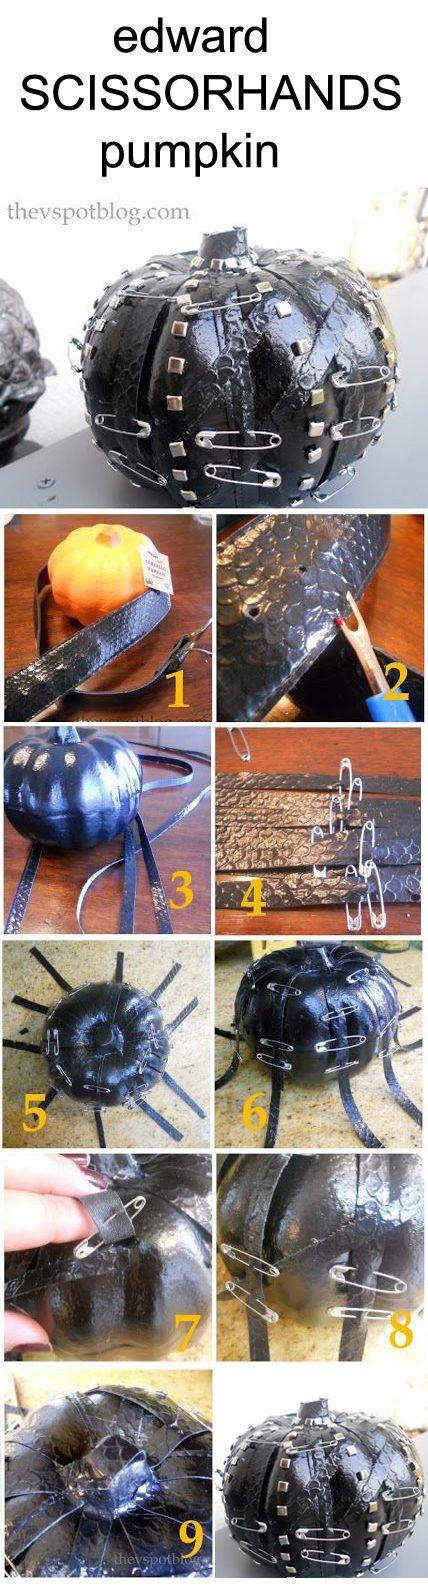 Make a leather studded punk Pumpkin for Halloween (\u201cMom\u2026? Why did